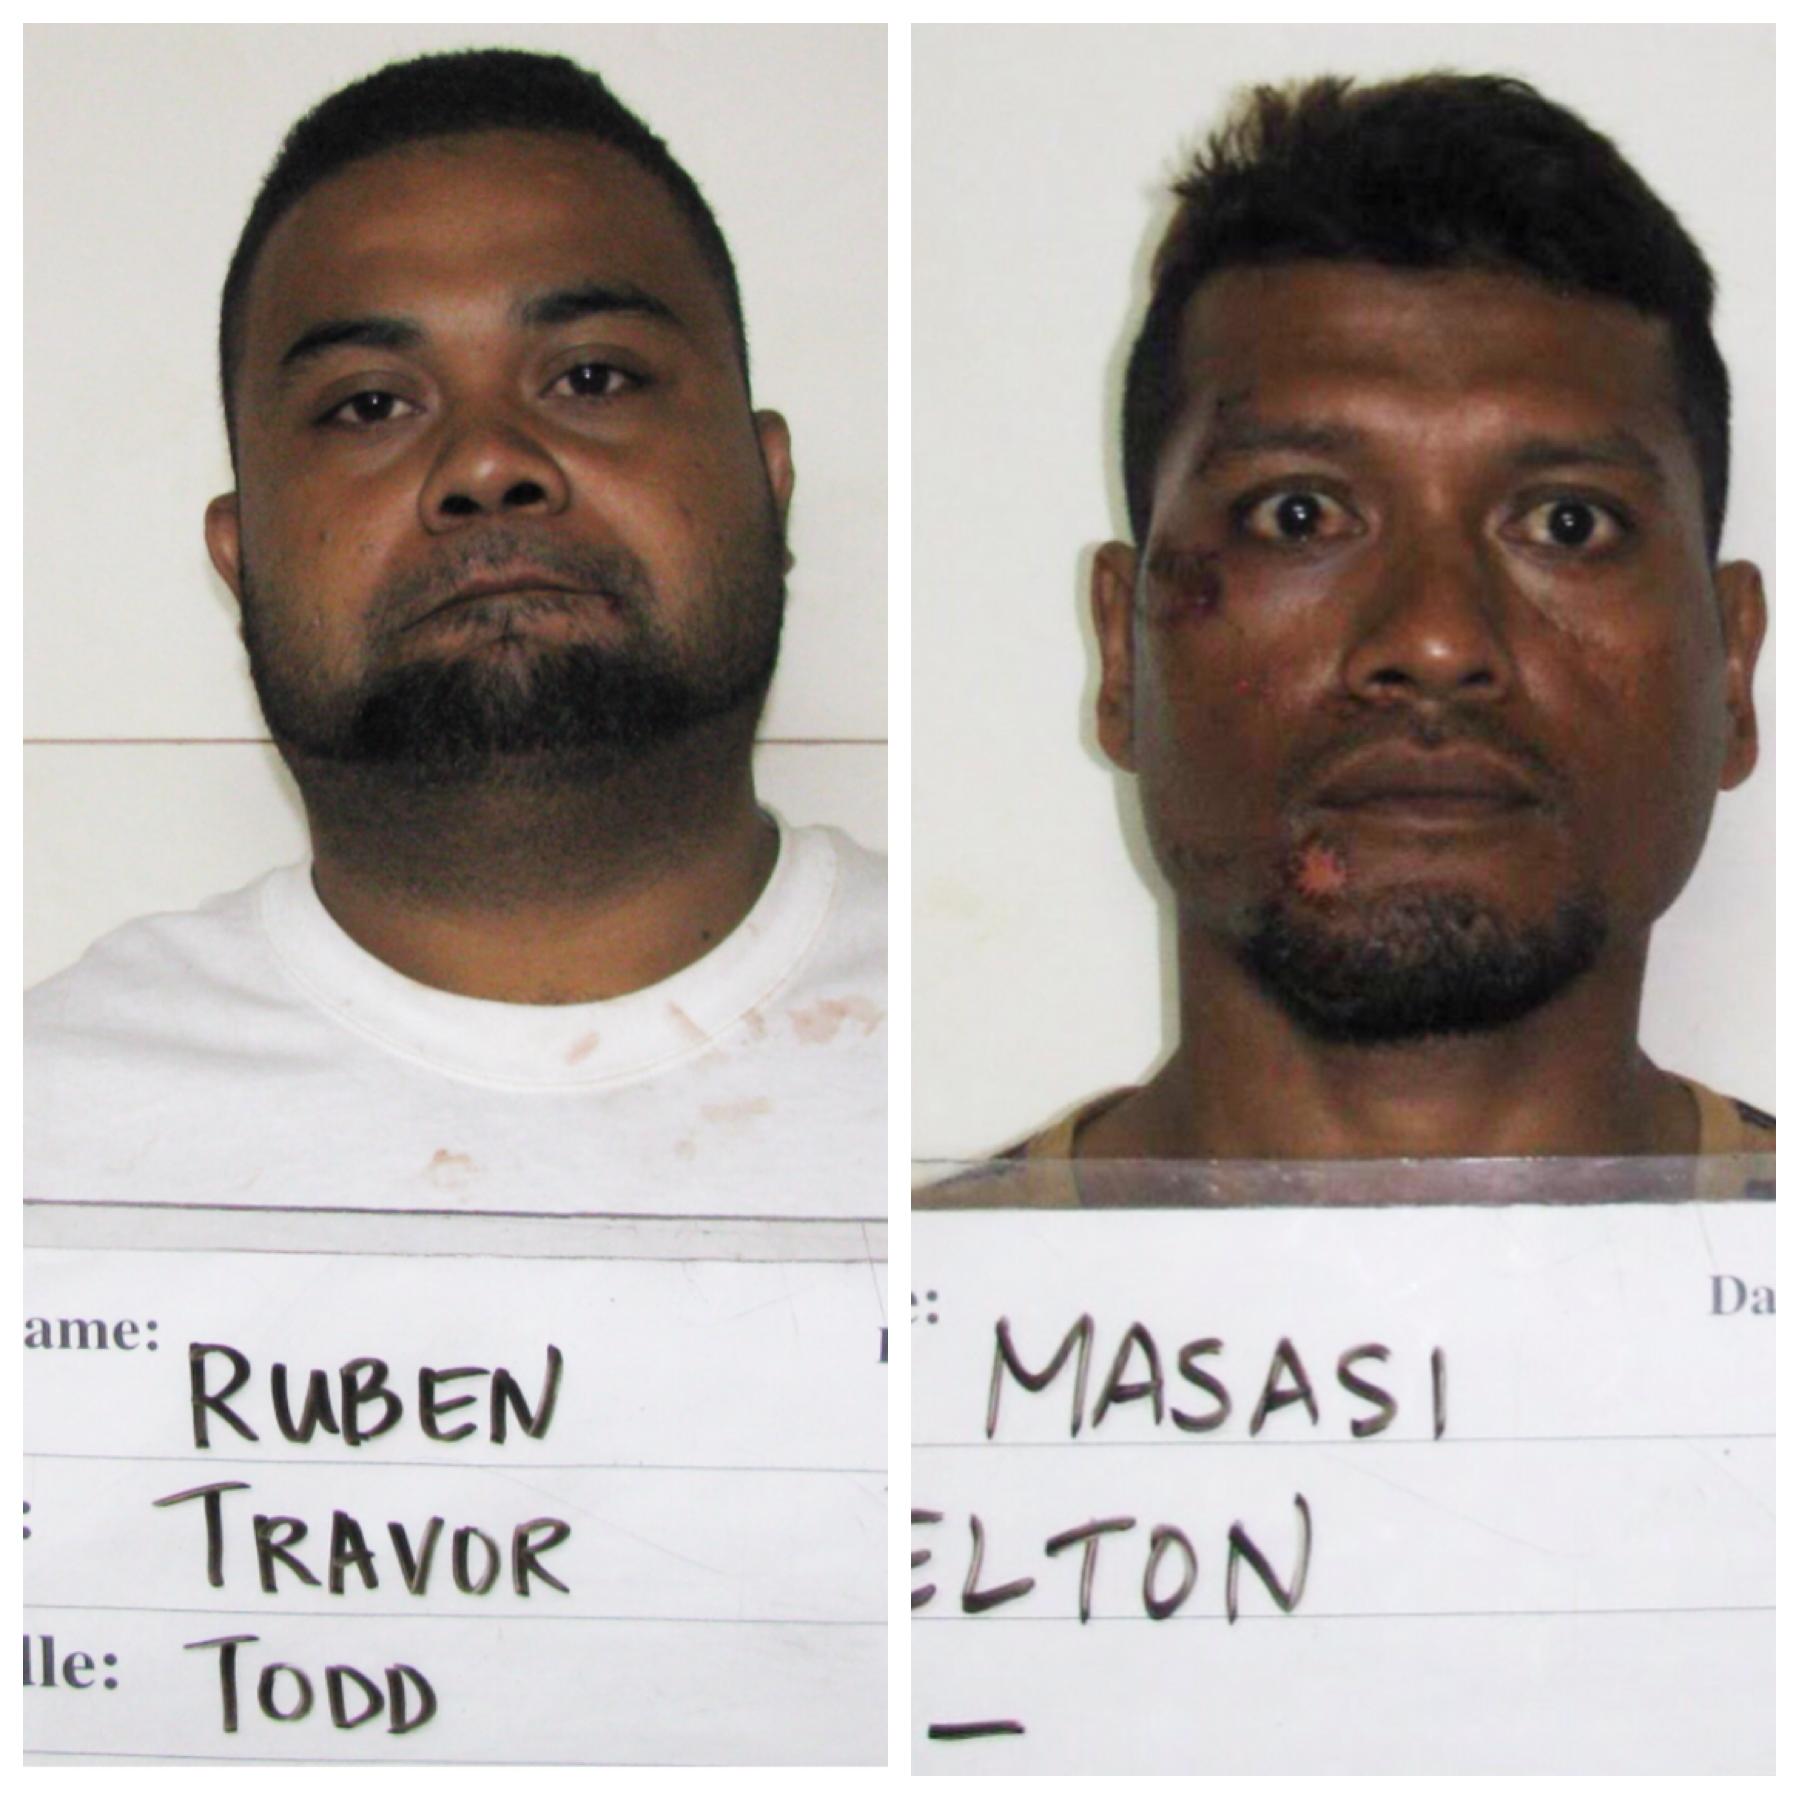 Travor Todd Ruben, Elton Masasi charged in road rage attack